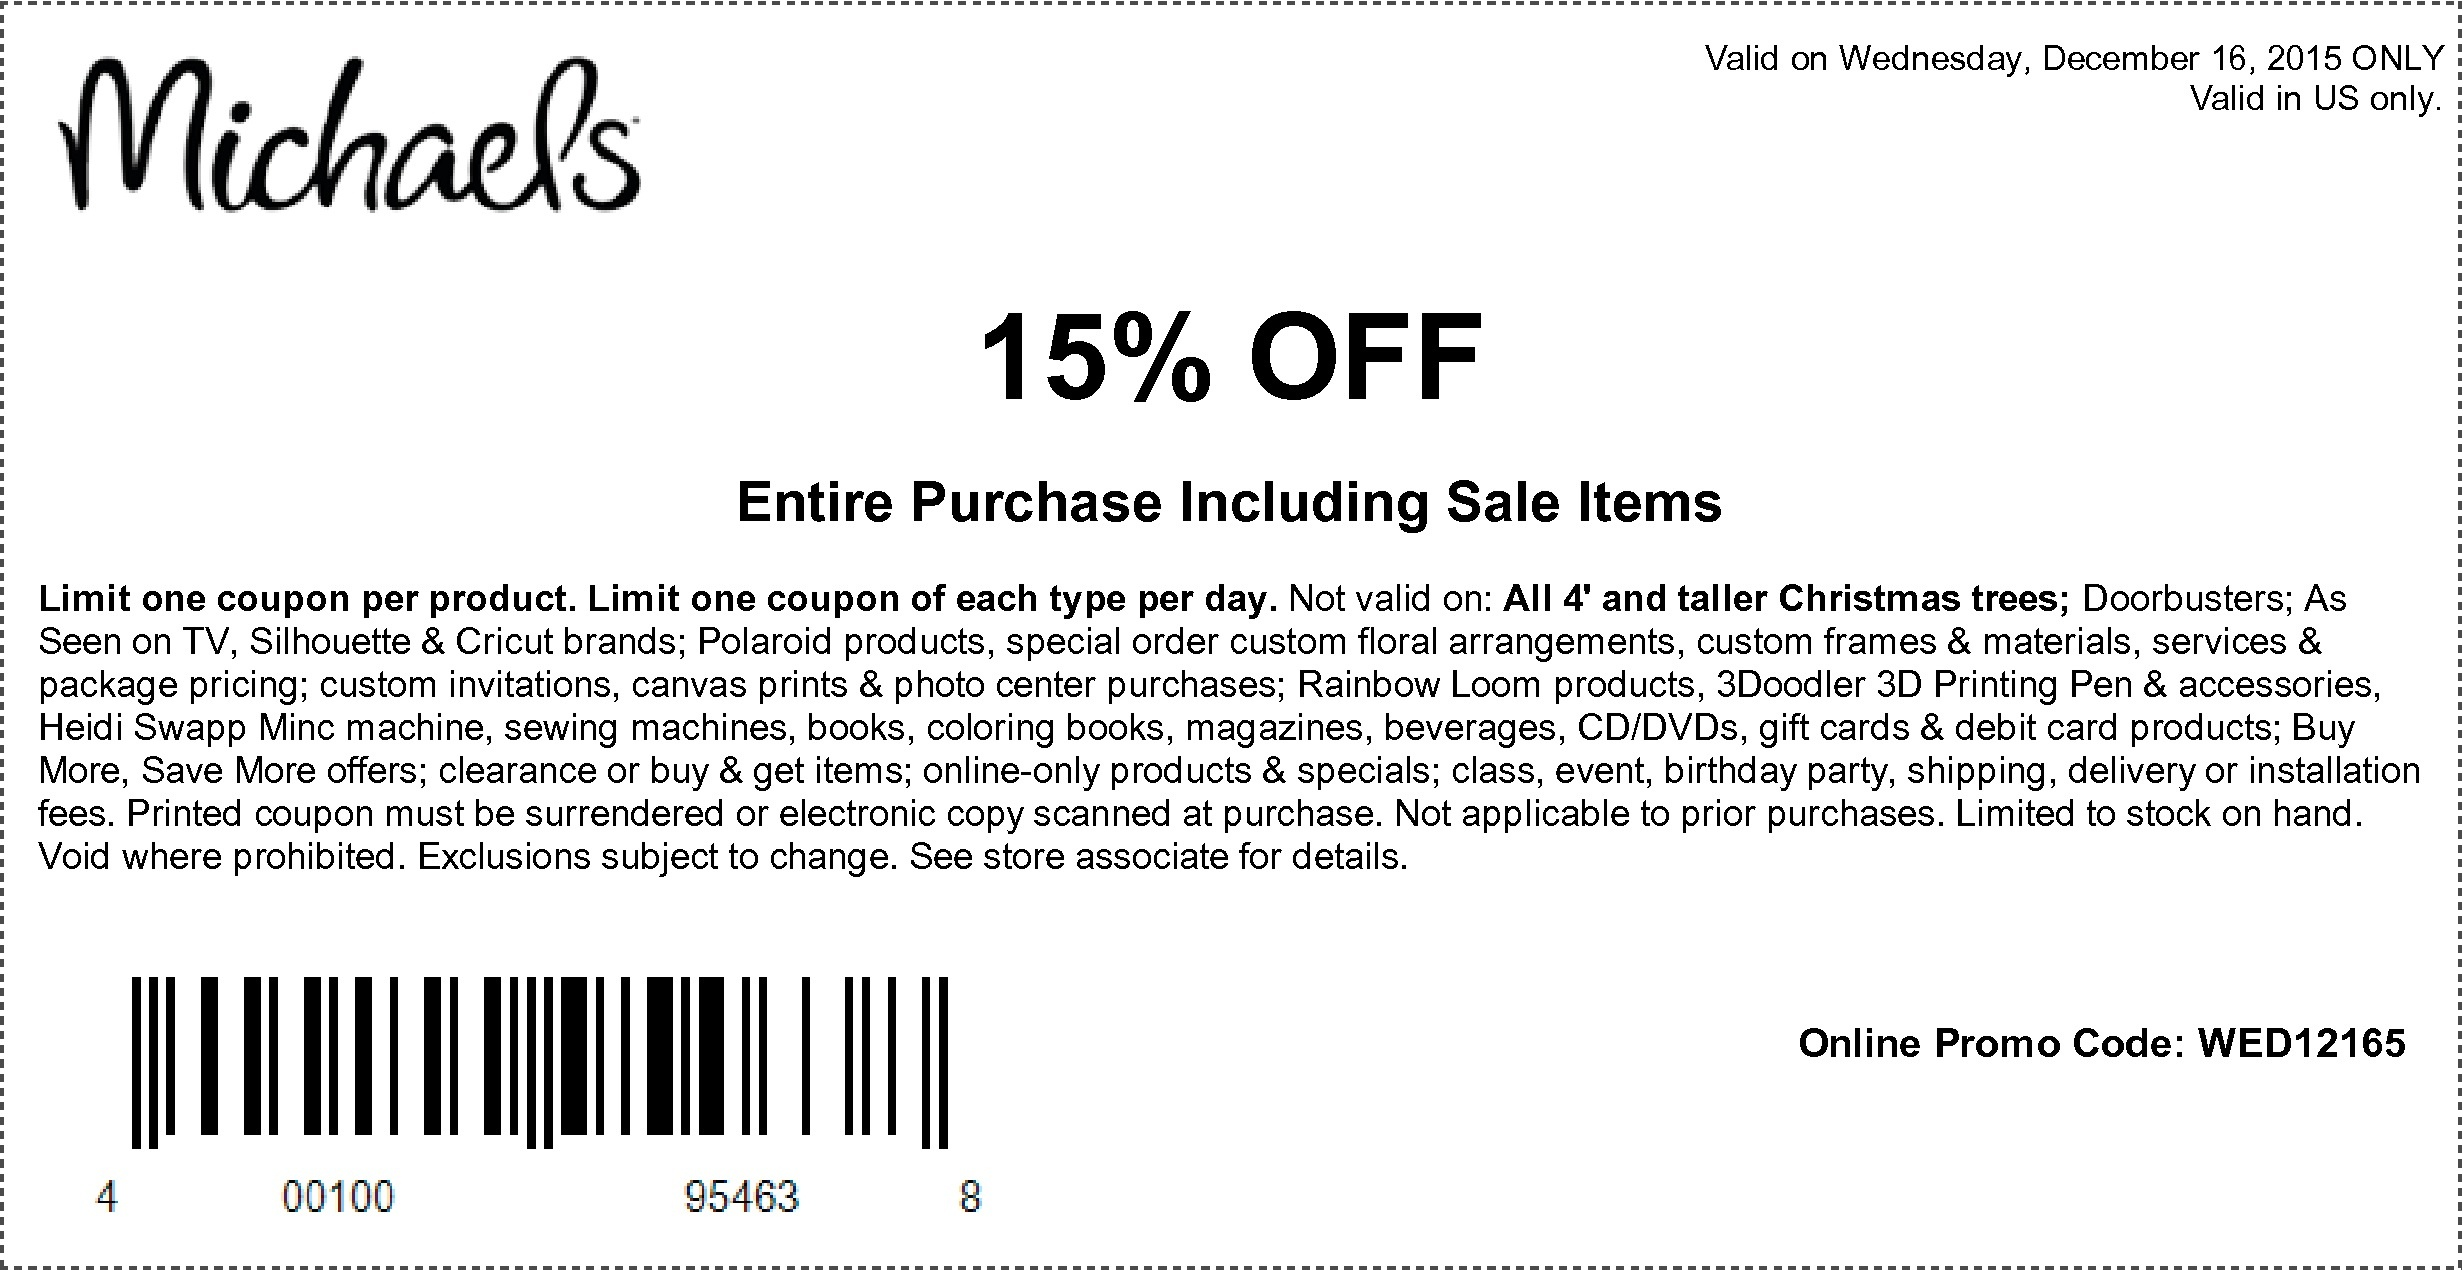 Michaels Free Printable Coupons | Printable Coupons Online - Free Printable Michaels Coupons